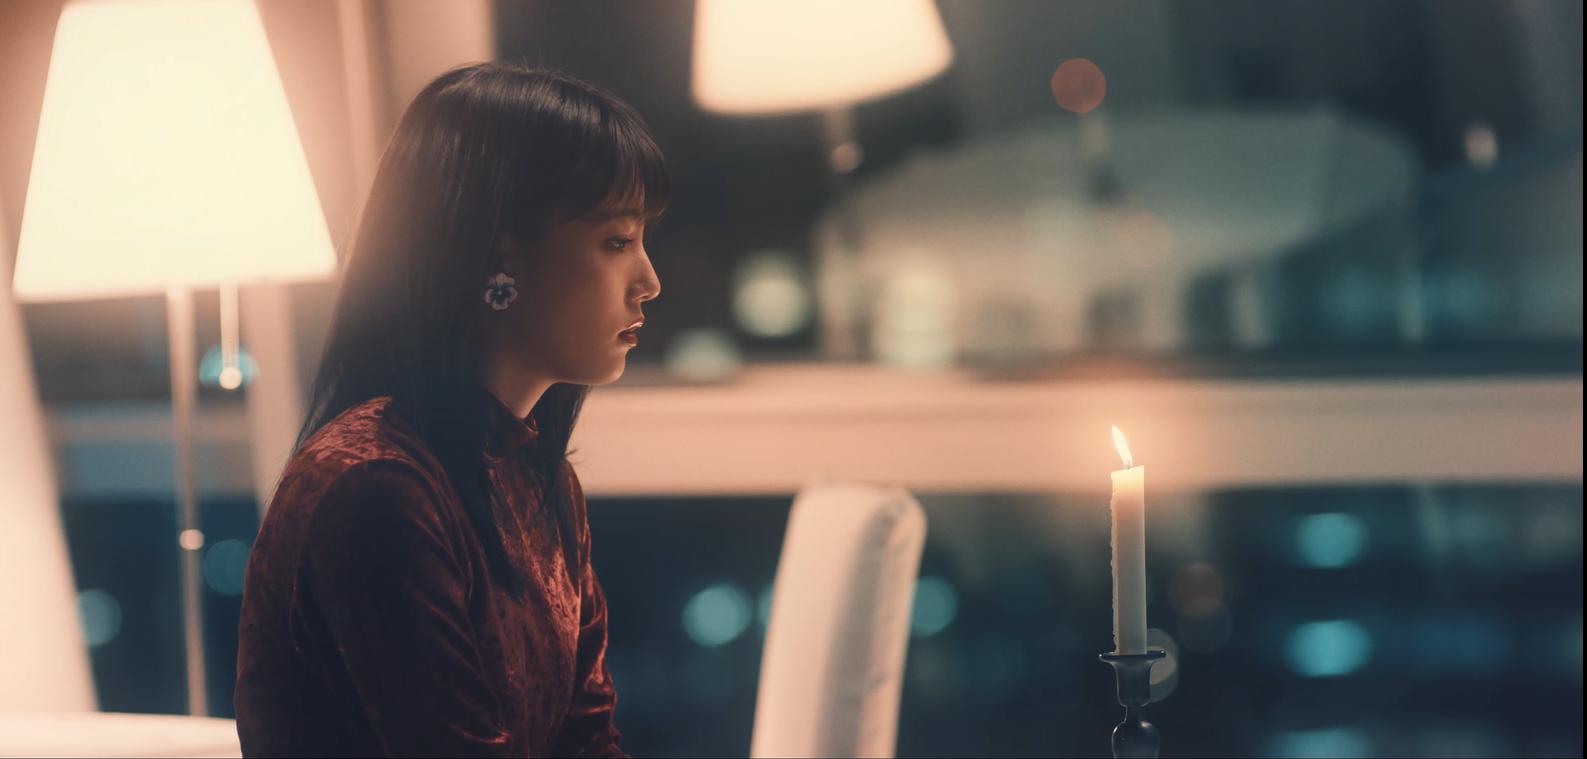 20thシングル『HAPPY BIRTHDAY』MUSIC VIDEO完成!!